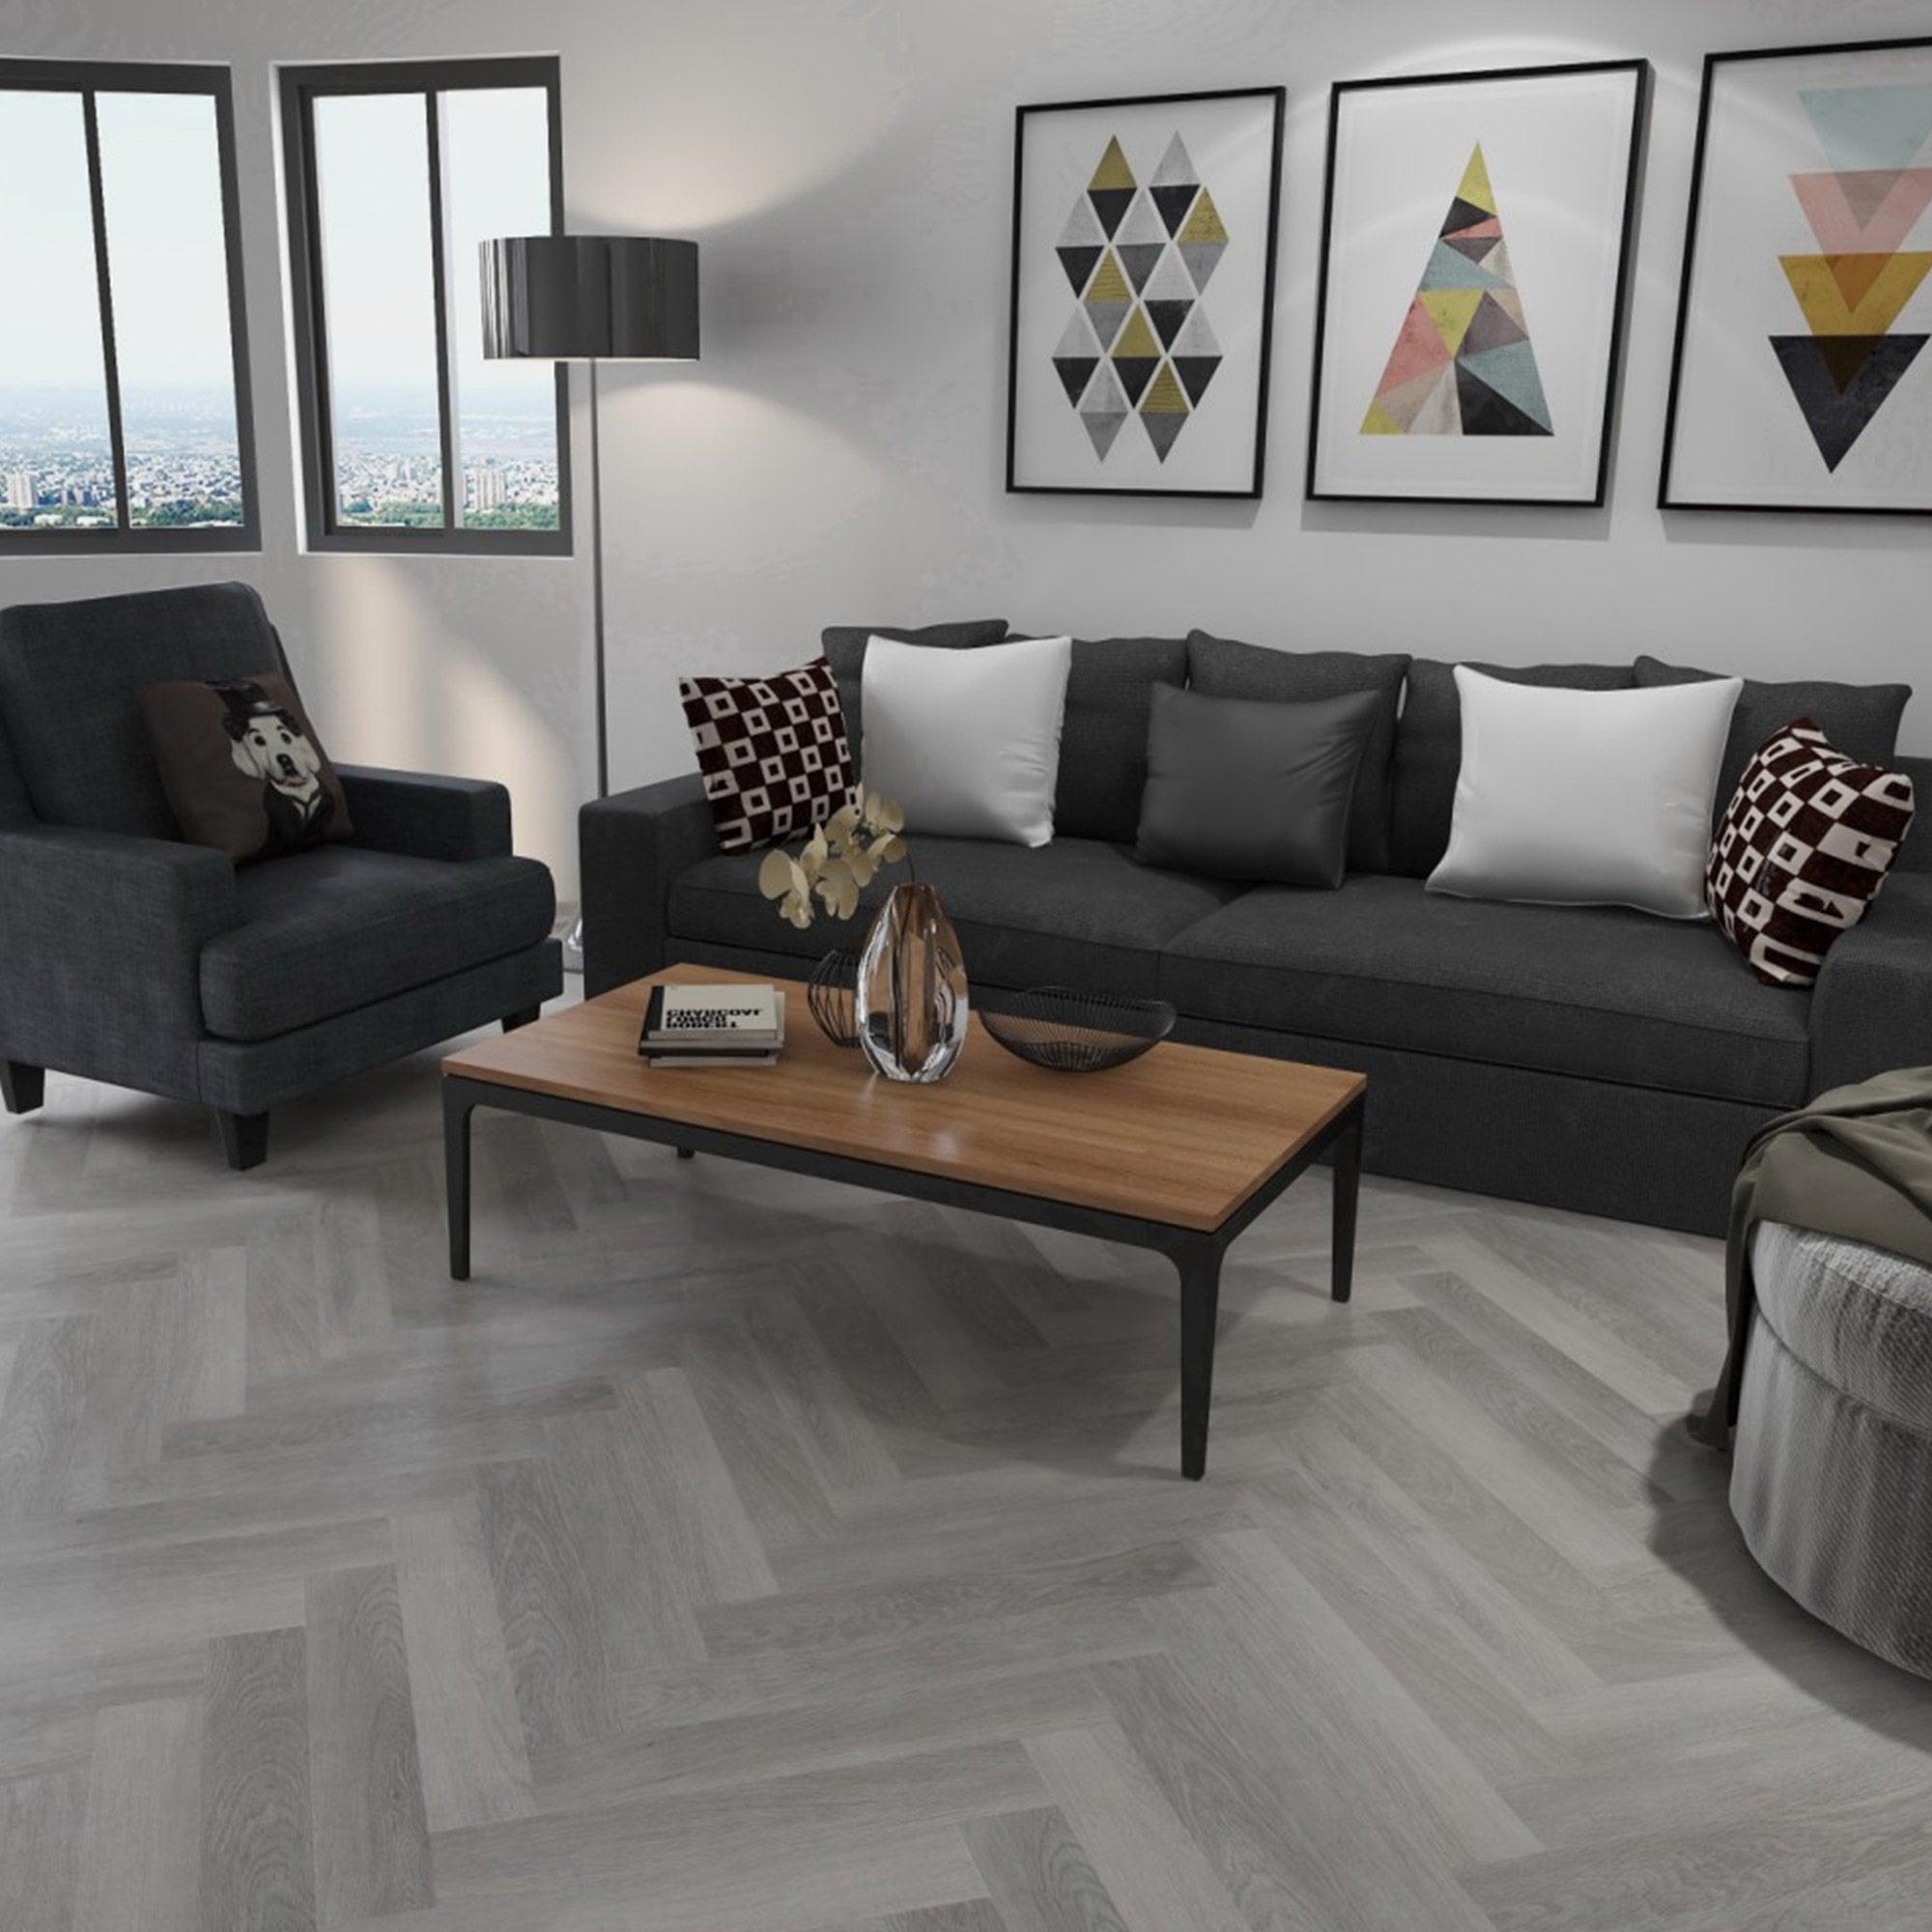 Liberty Floors Herringbone Spc 5 5mm, Grey Floor Living Room